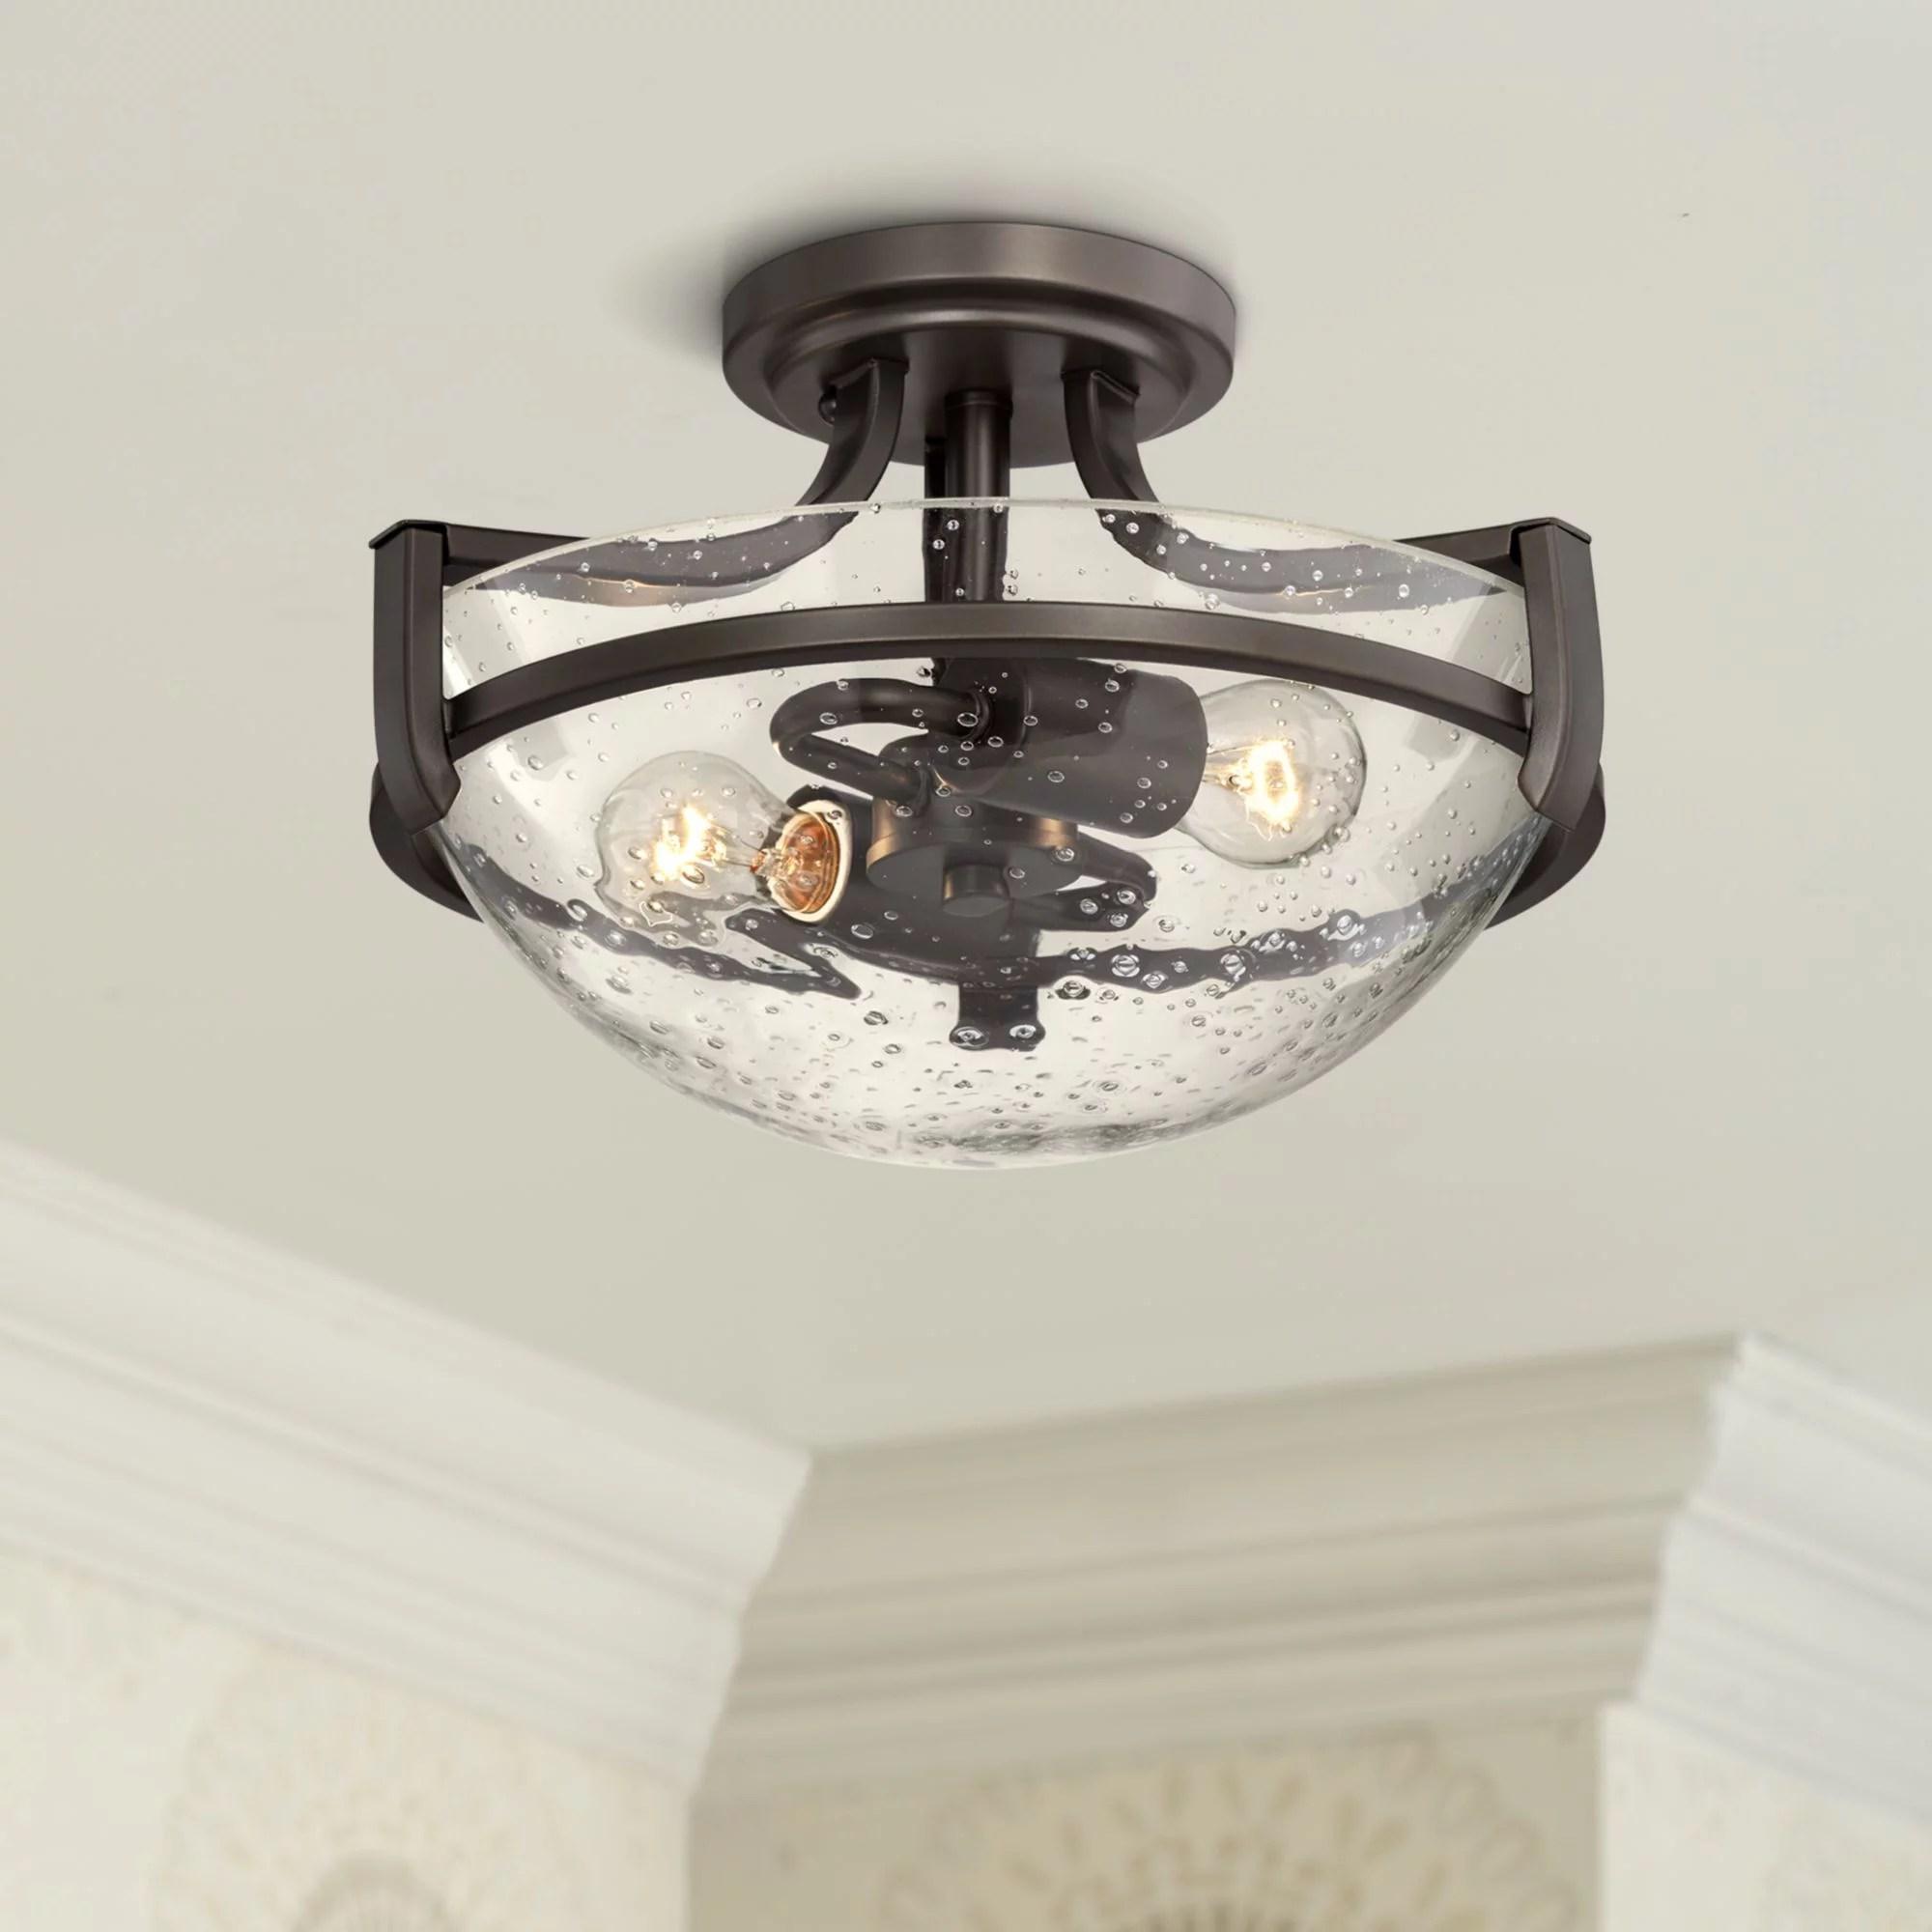 regency hill modern ceiling light semi flush mount fixture oil rubbed bronze 13 wide 2 light clear seedy glass bowl for bedroom